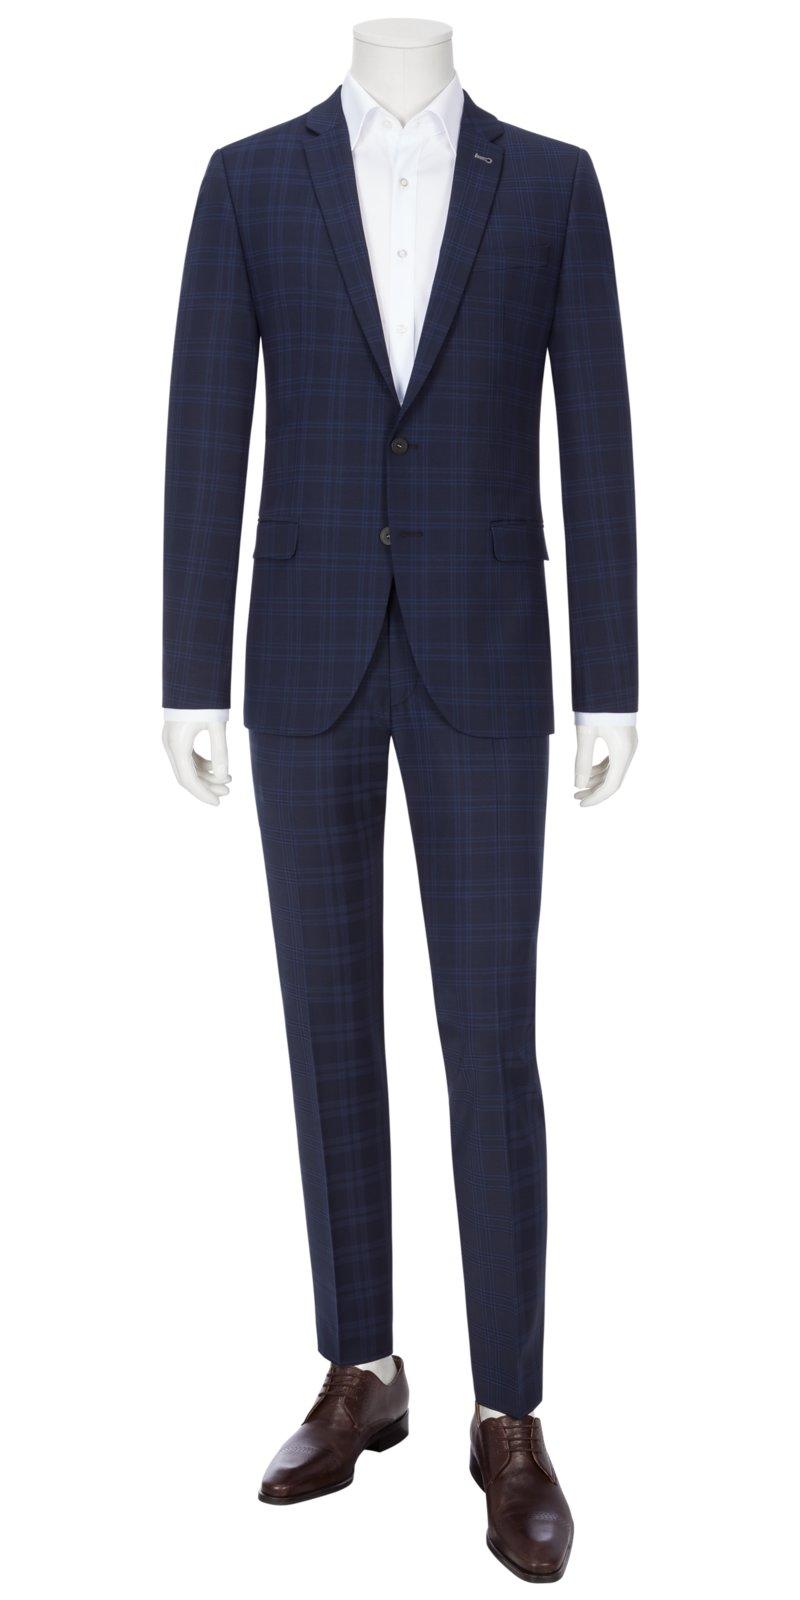 anzug slim fit roy robson slim fit anzug in schwarz ebay. Black Bedroom Furniture Sets. Home Design Ideas